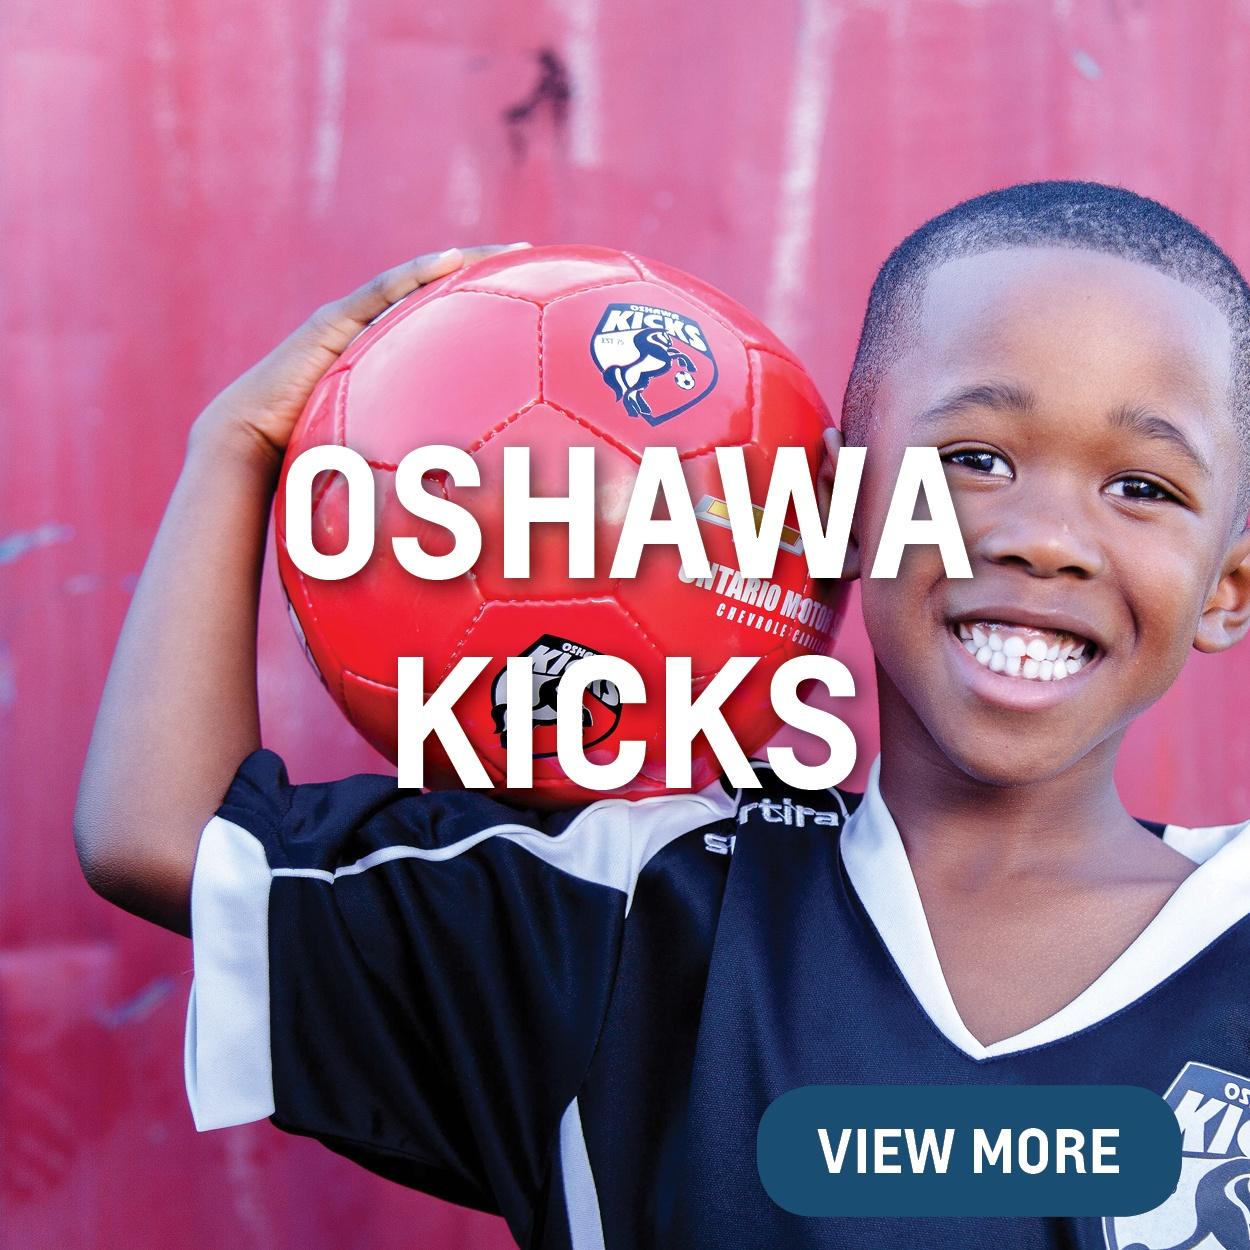 Oshawa Kicks